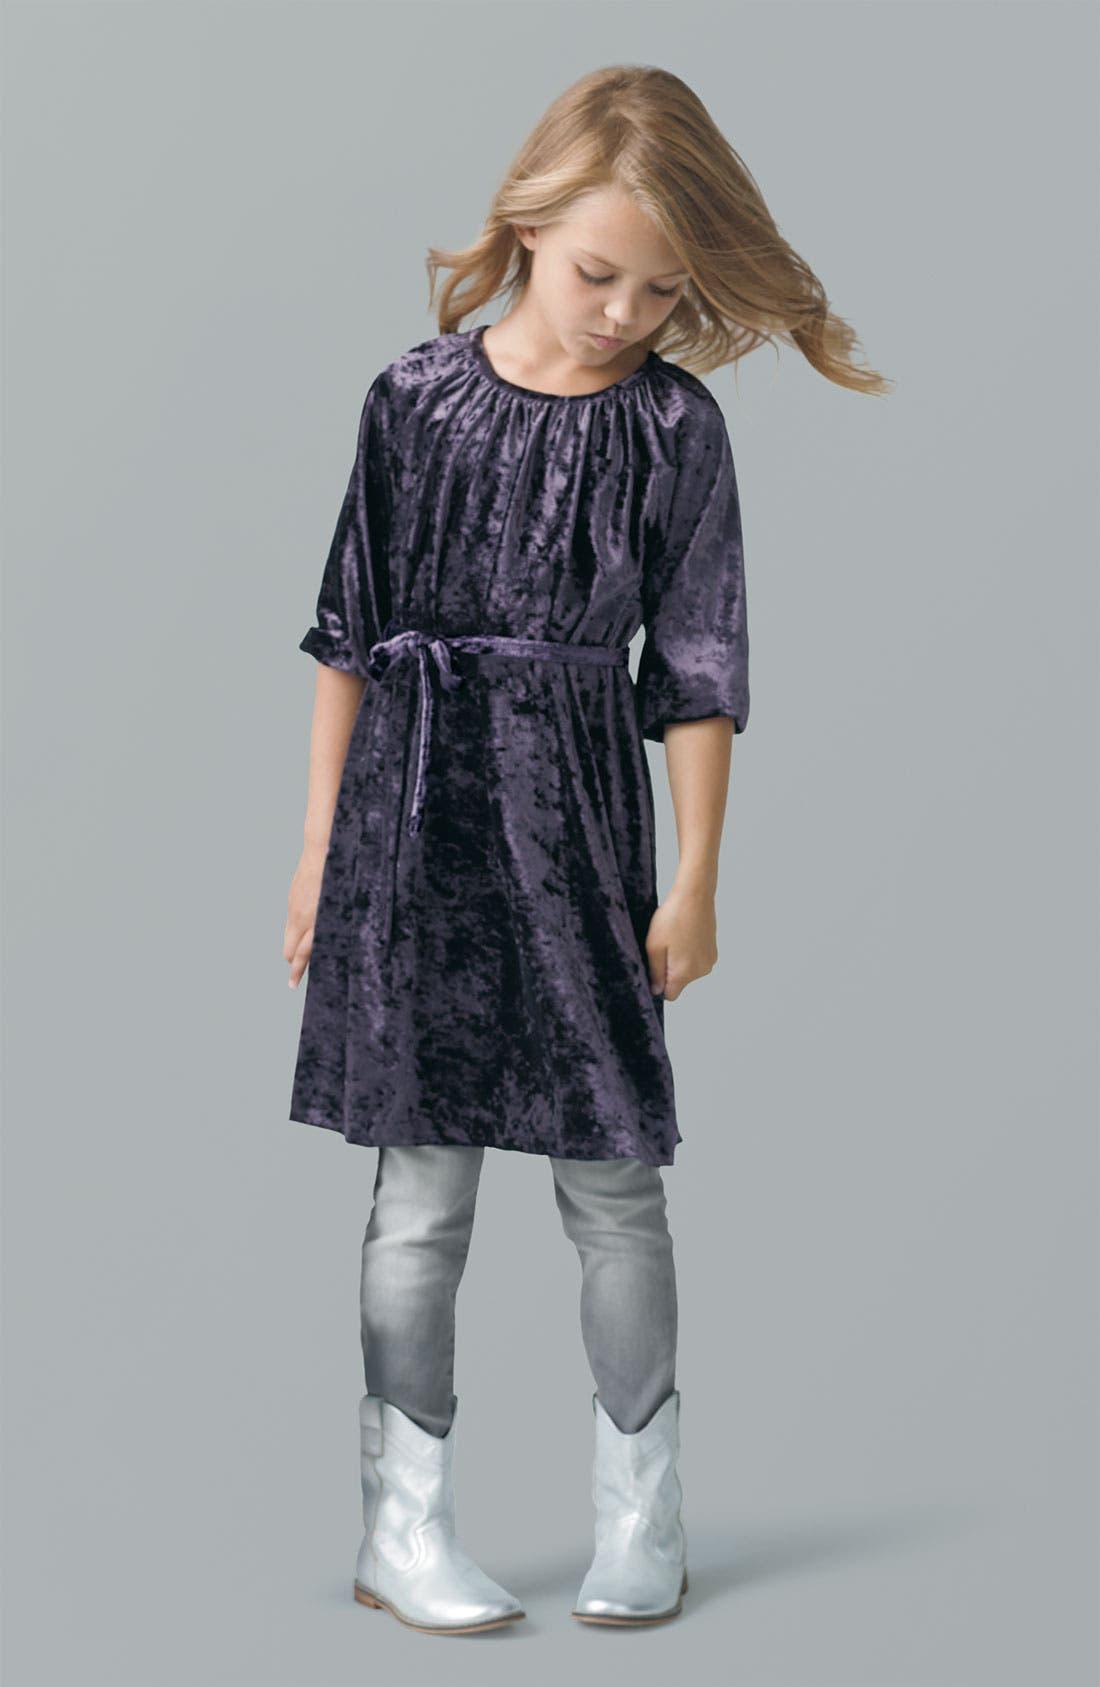 Main Image - Peek Dress & Jeans (Toddler, Little Girls & Big Girls)